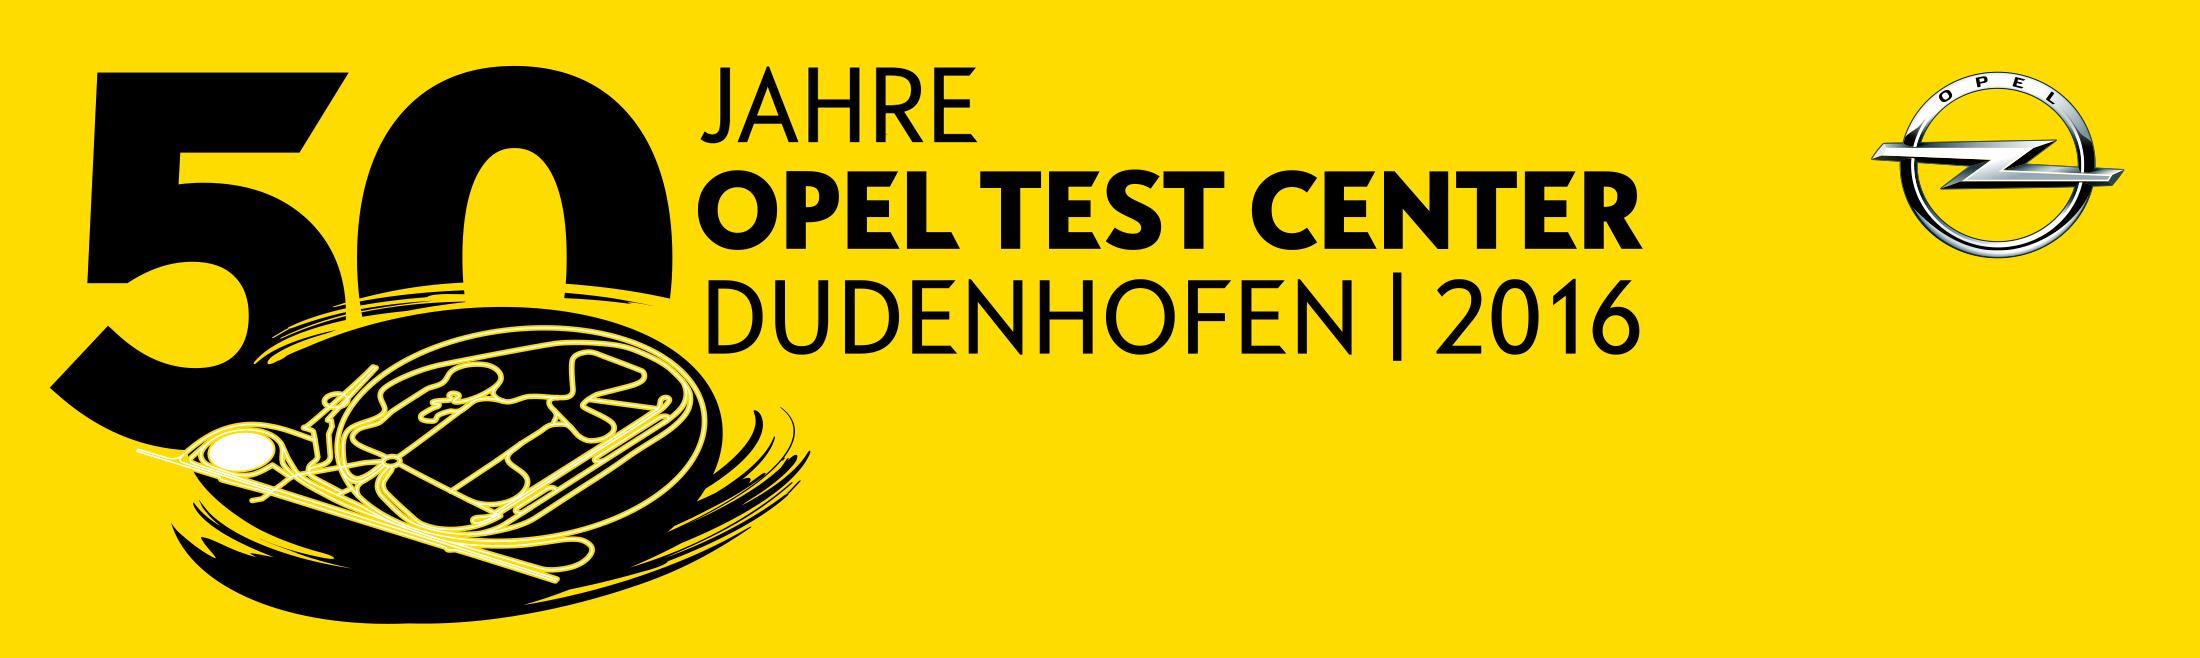 Logo_50Years_Dudenhofen_175x55